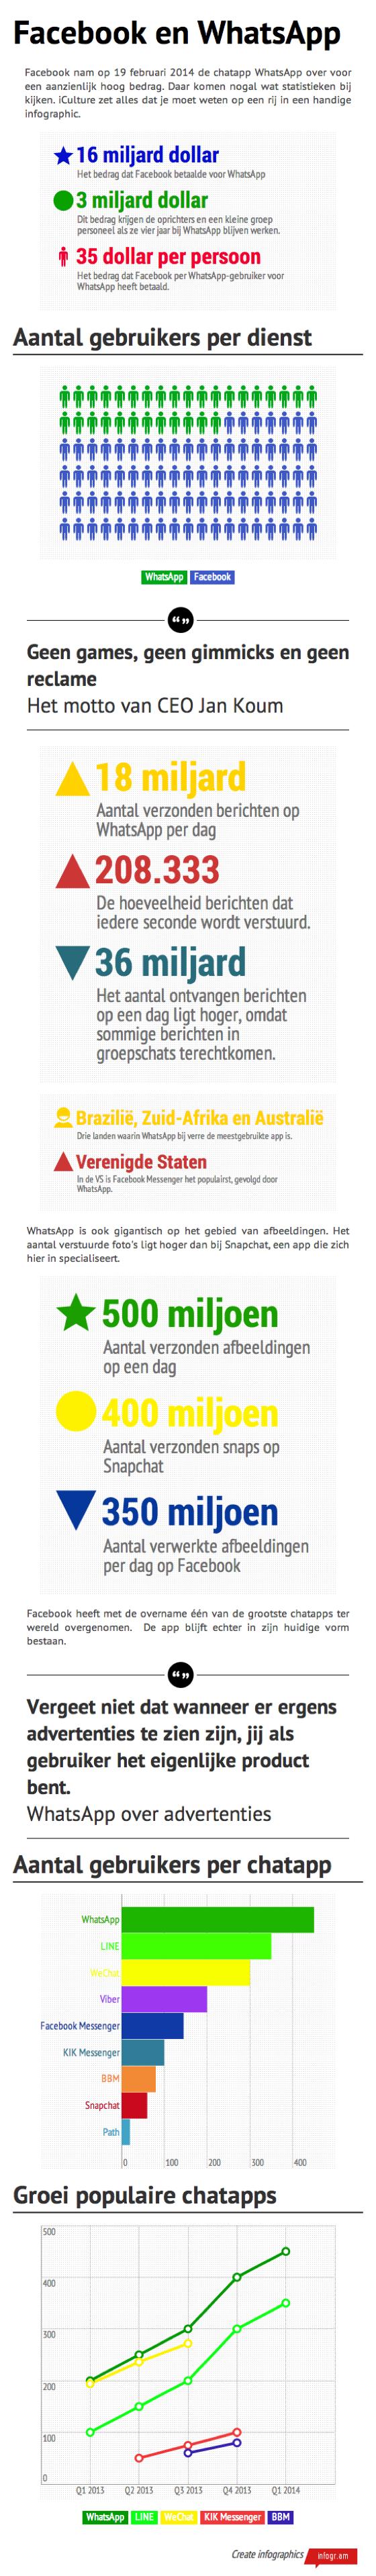 Infographic Facebook WhatsApp